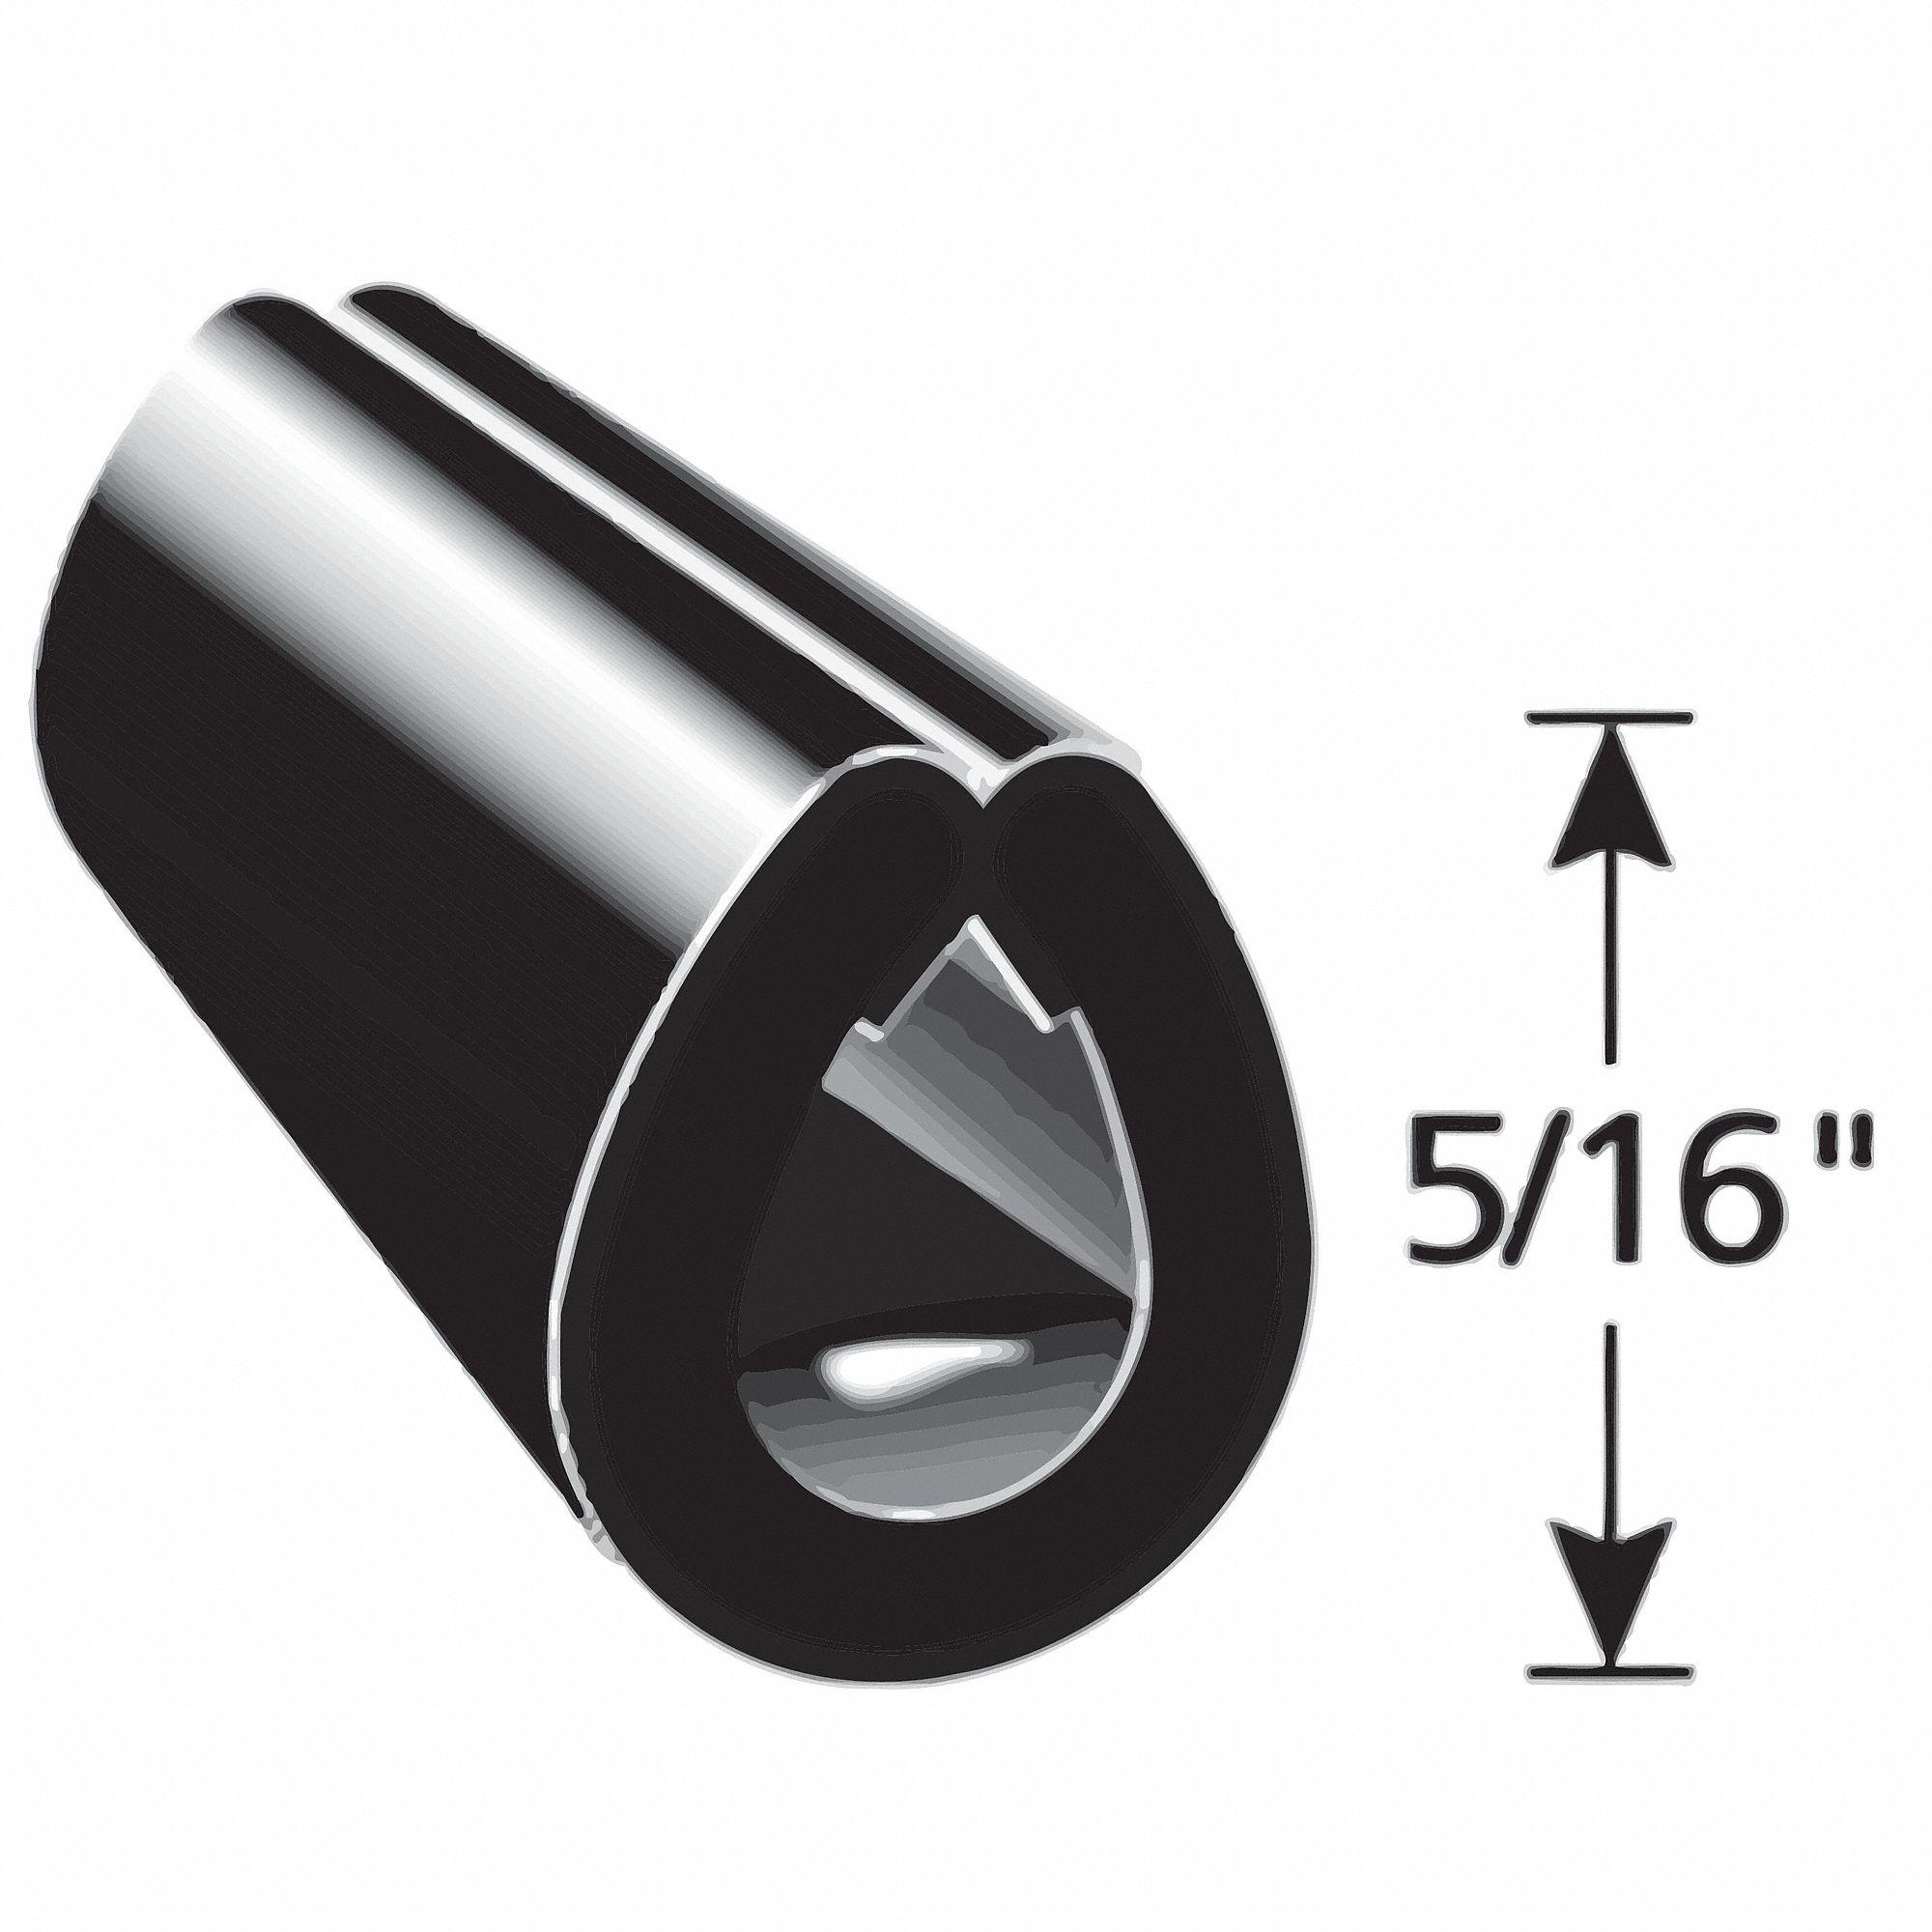 Black Edge TRIM LOK I PVC L,0.375 in 1375B3X3//8-25 Aluminum Edge Trim,25 ft